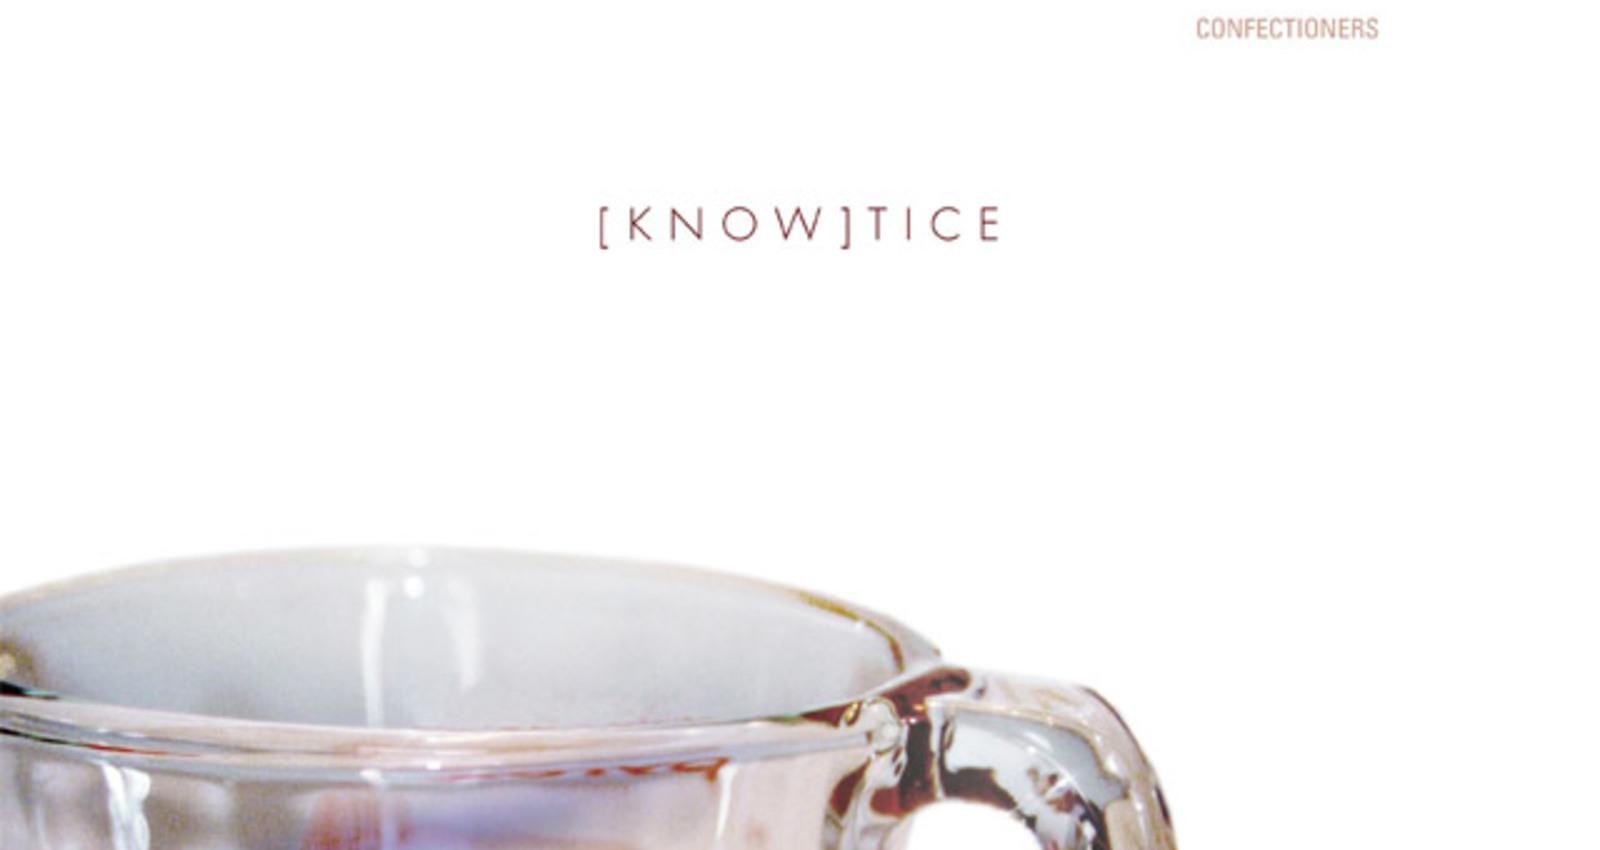 [KNOW]TICE